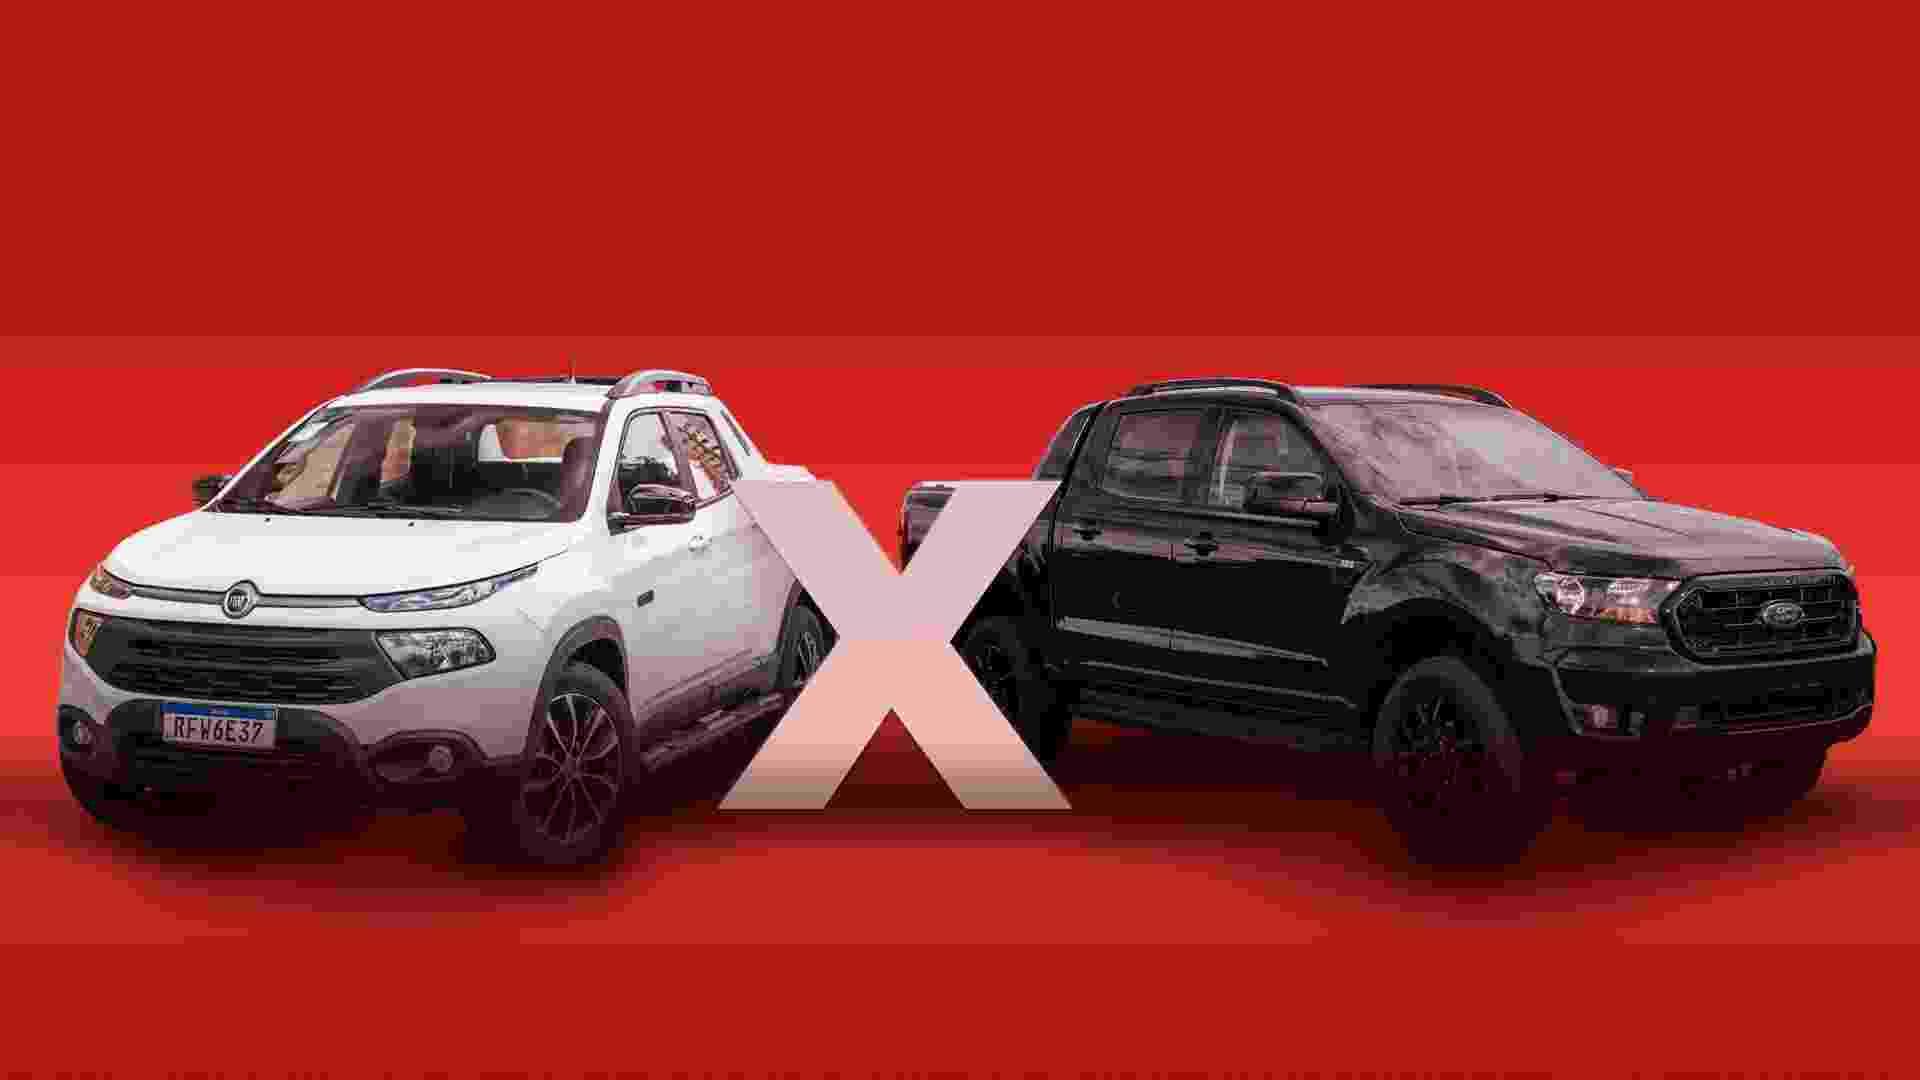 Arte - Ford Ranger Black x Fiat Toro Ultra - horizontal - Arte UOL